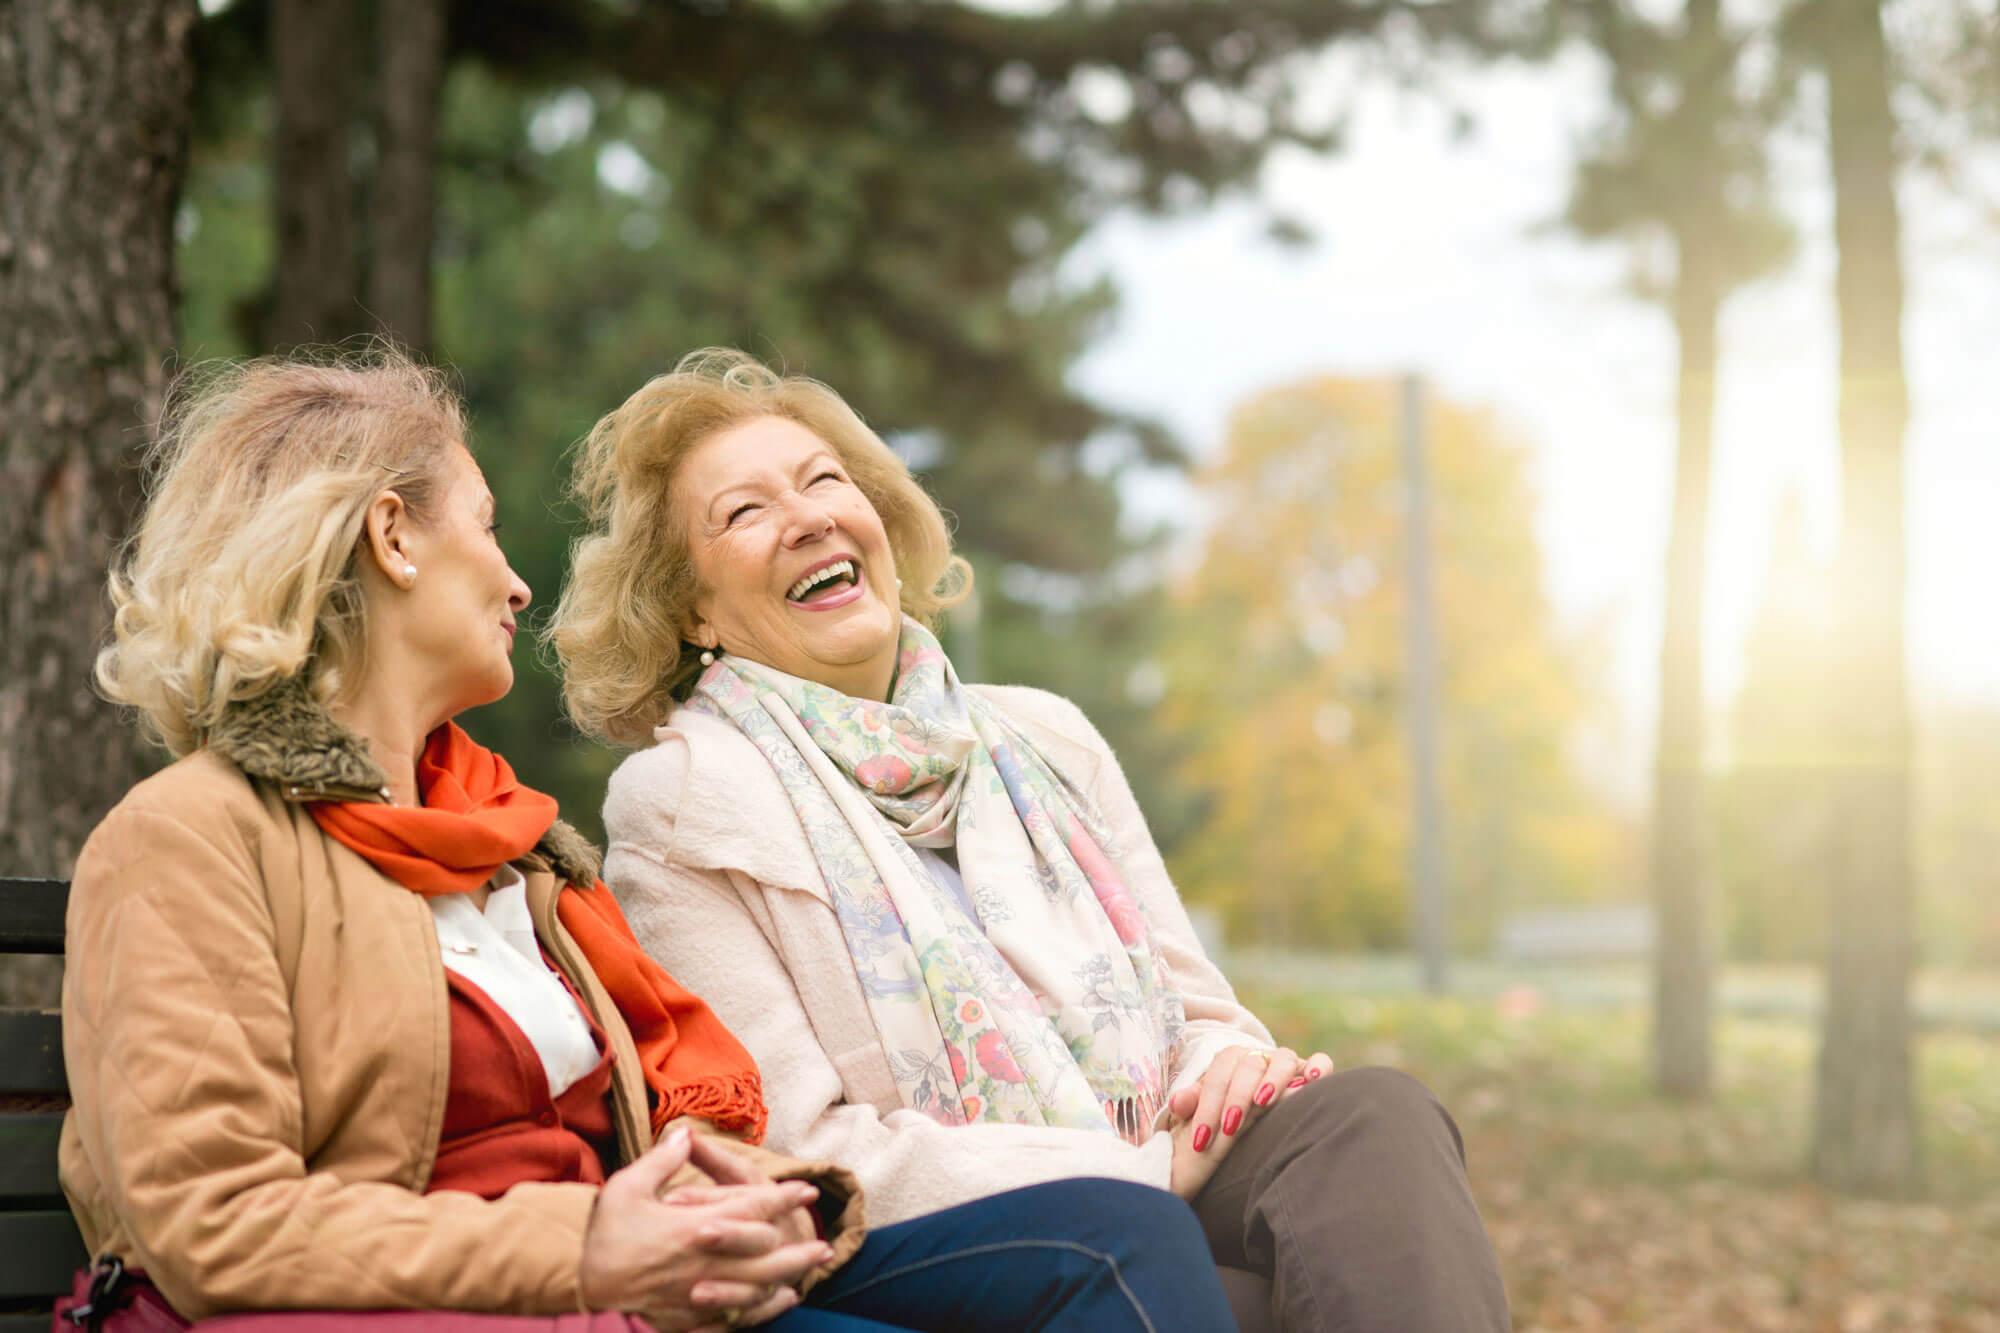 Two senior people enjoying time outside.